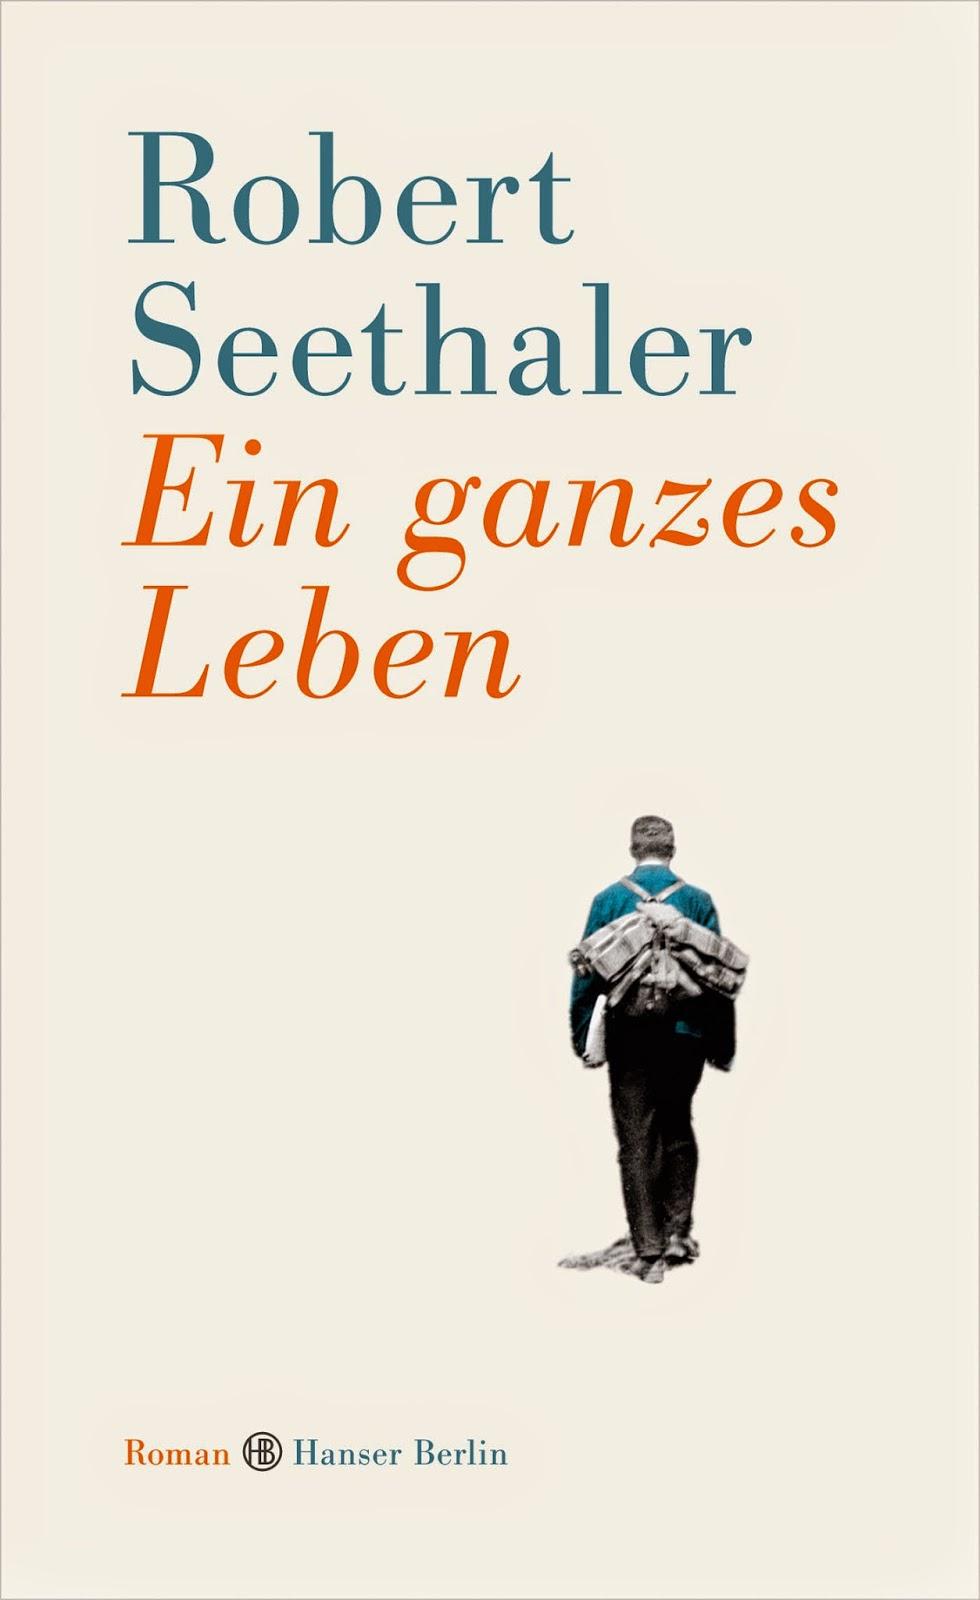 http://www.hanser-literaturverlage.de/buecher/buch.html?isbn=978-3-446-24645-4